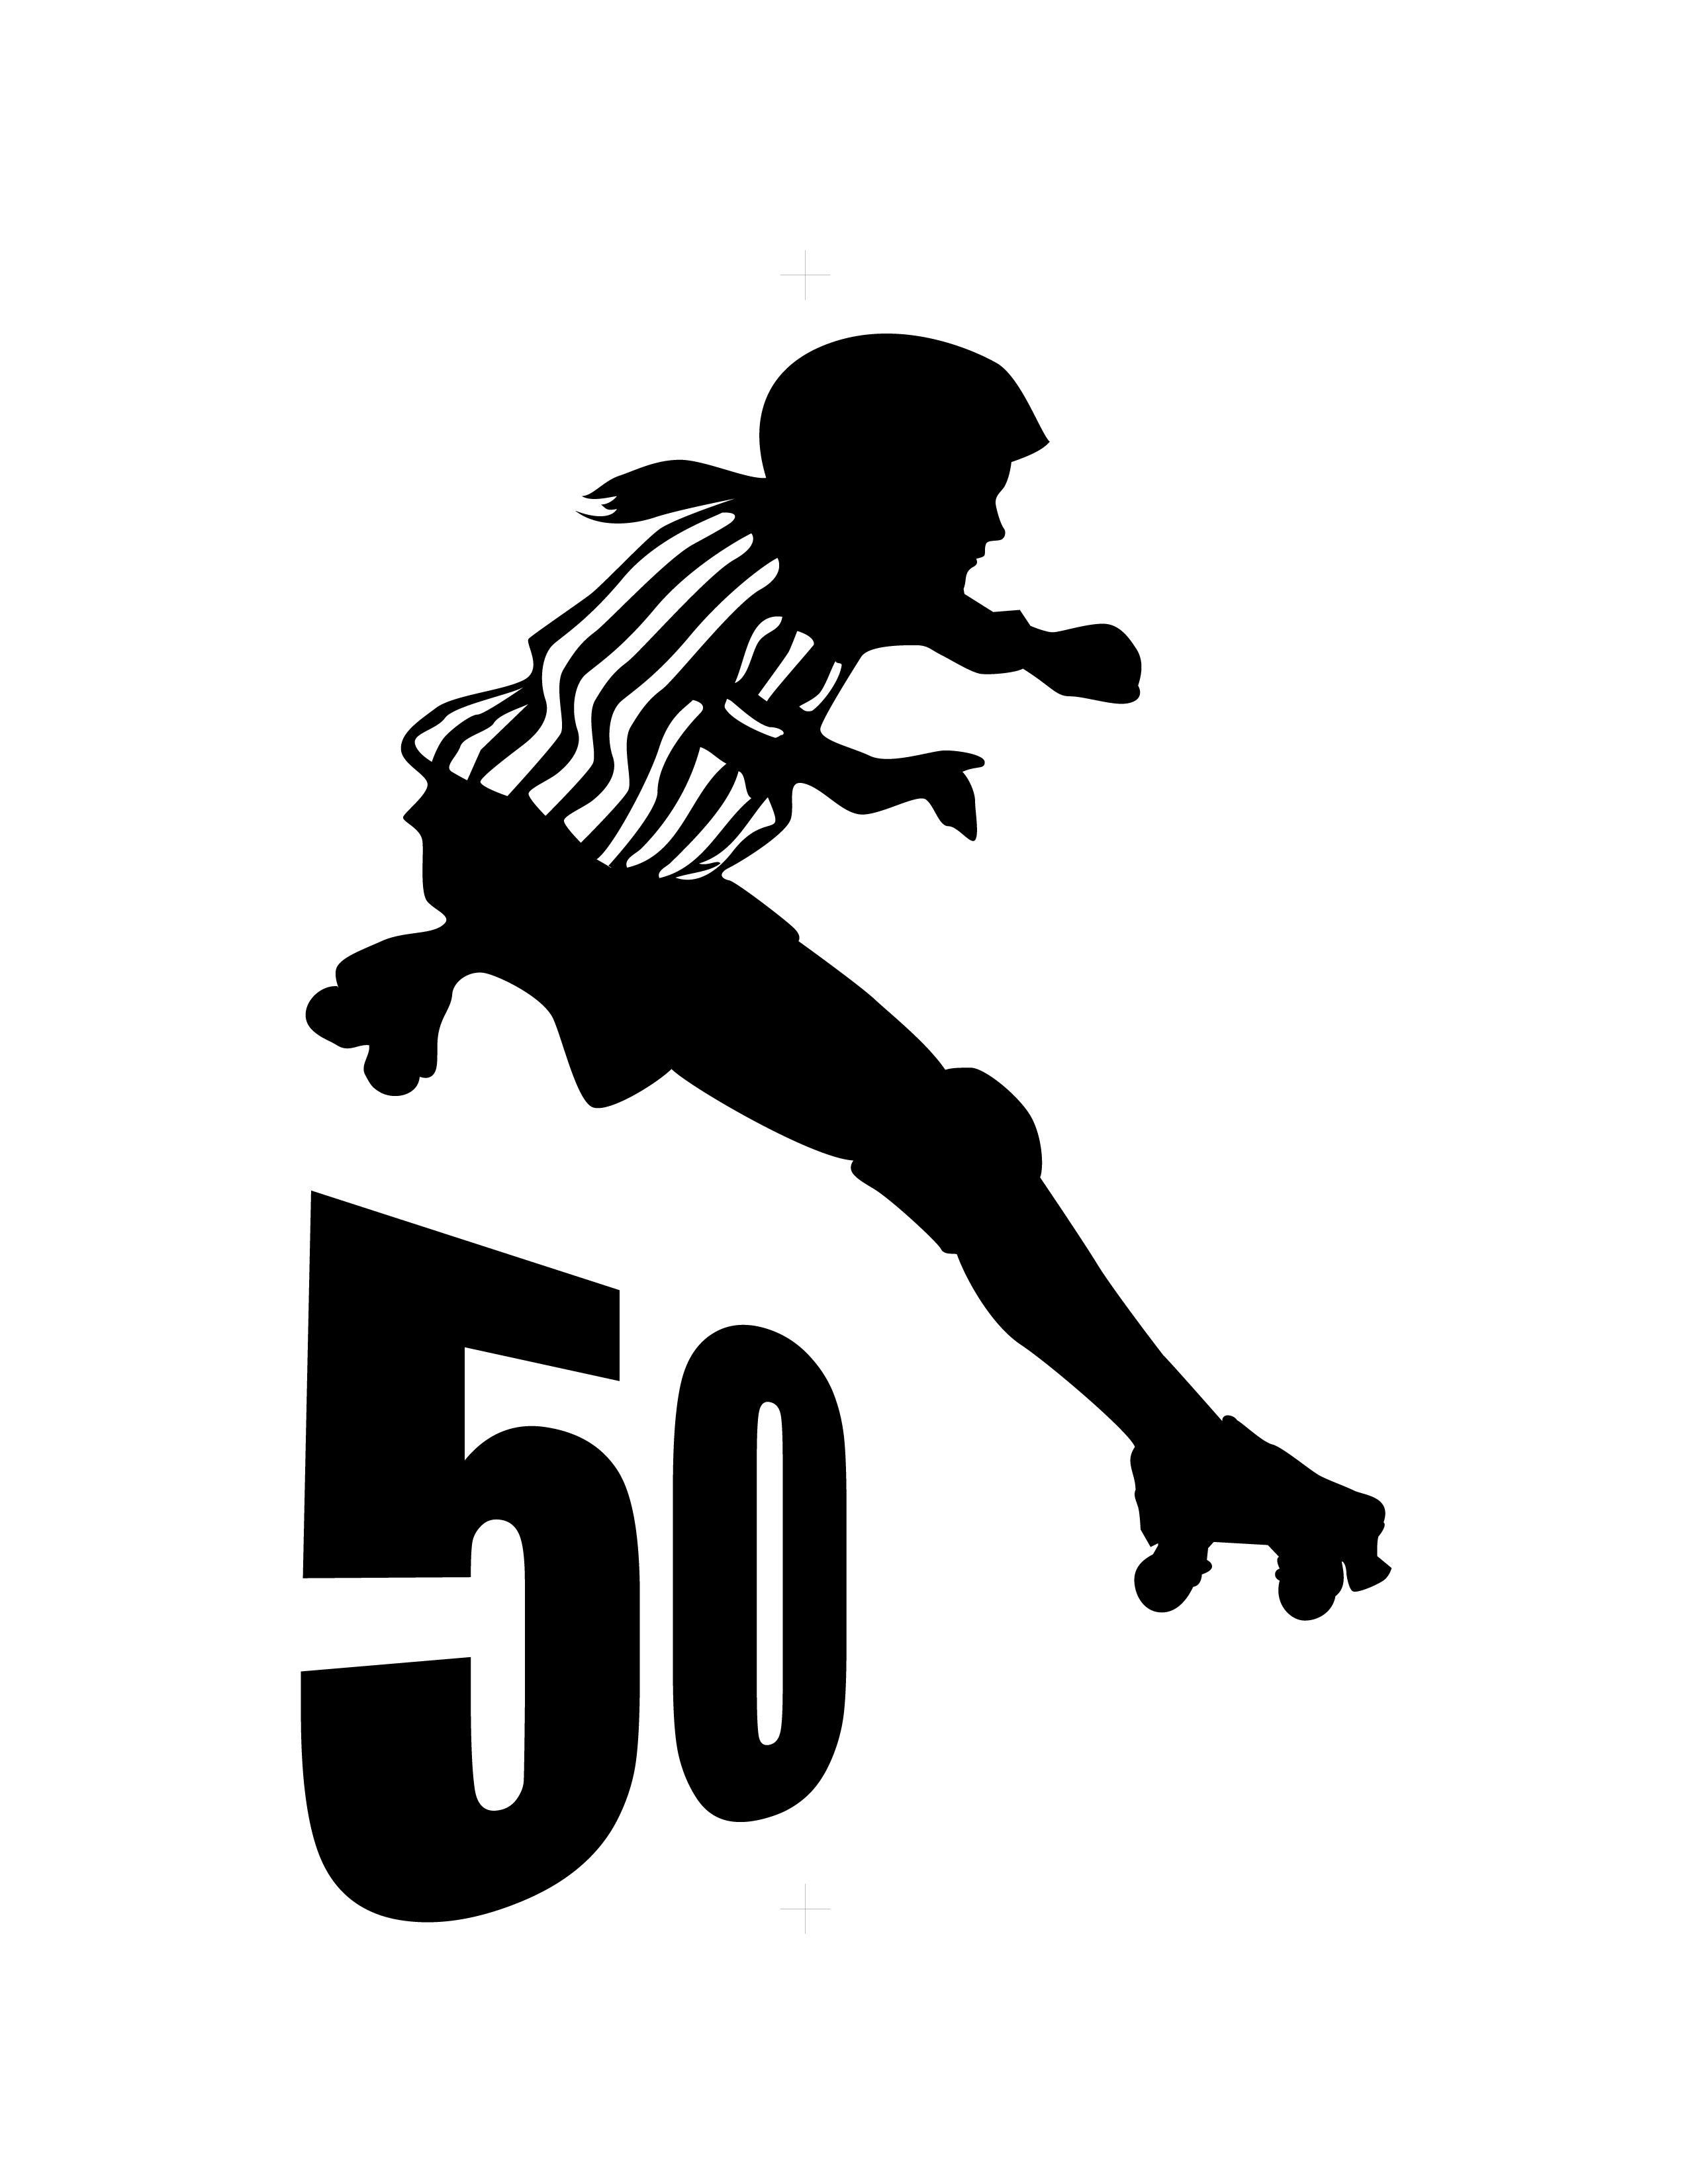 Zebra over 50